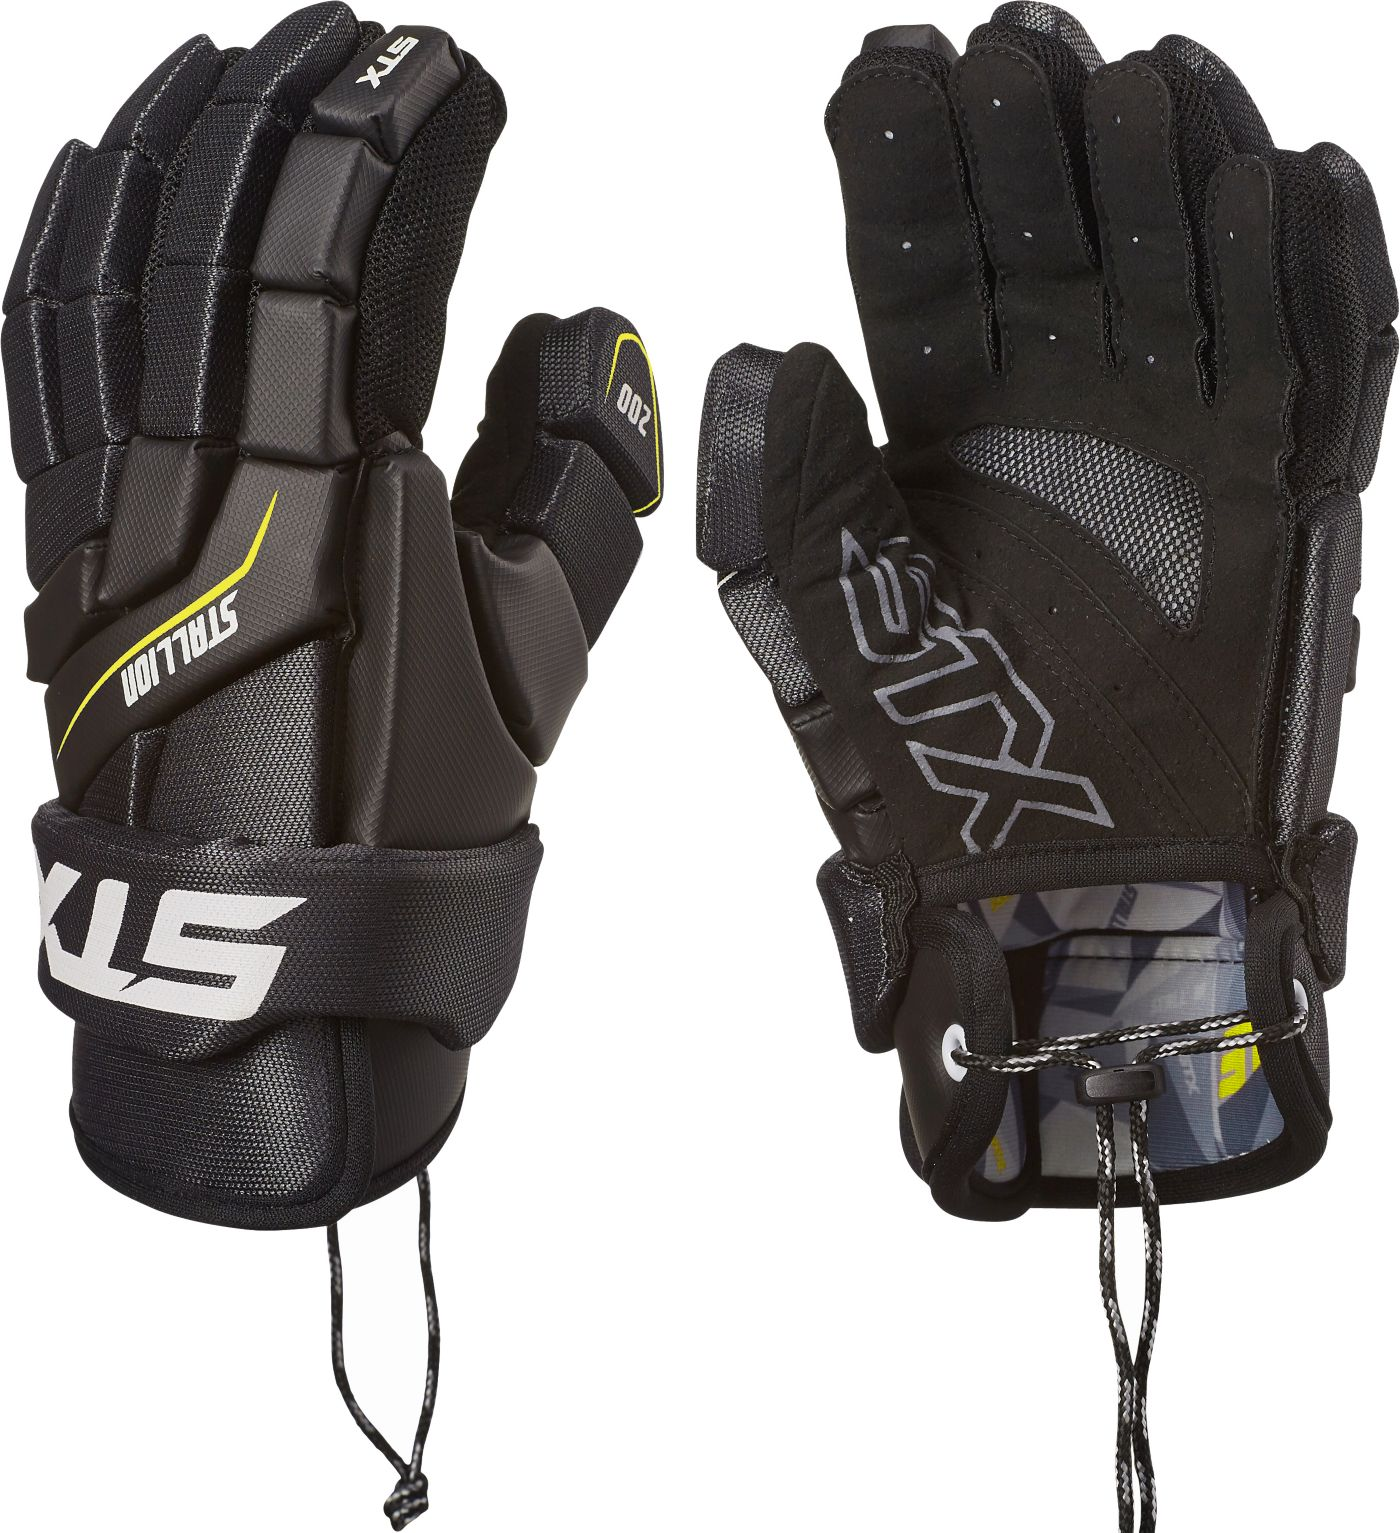 STX Youth Stallion 200 Lacrosse Gloves